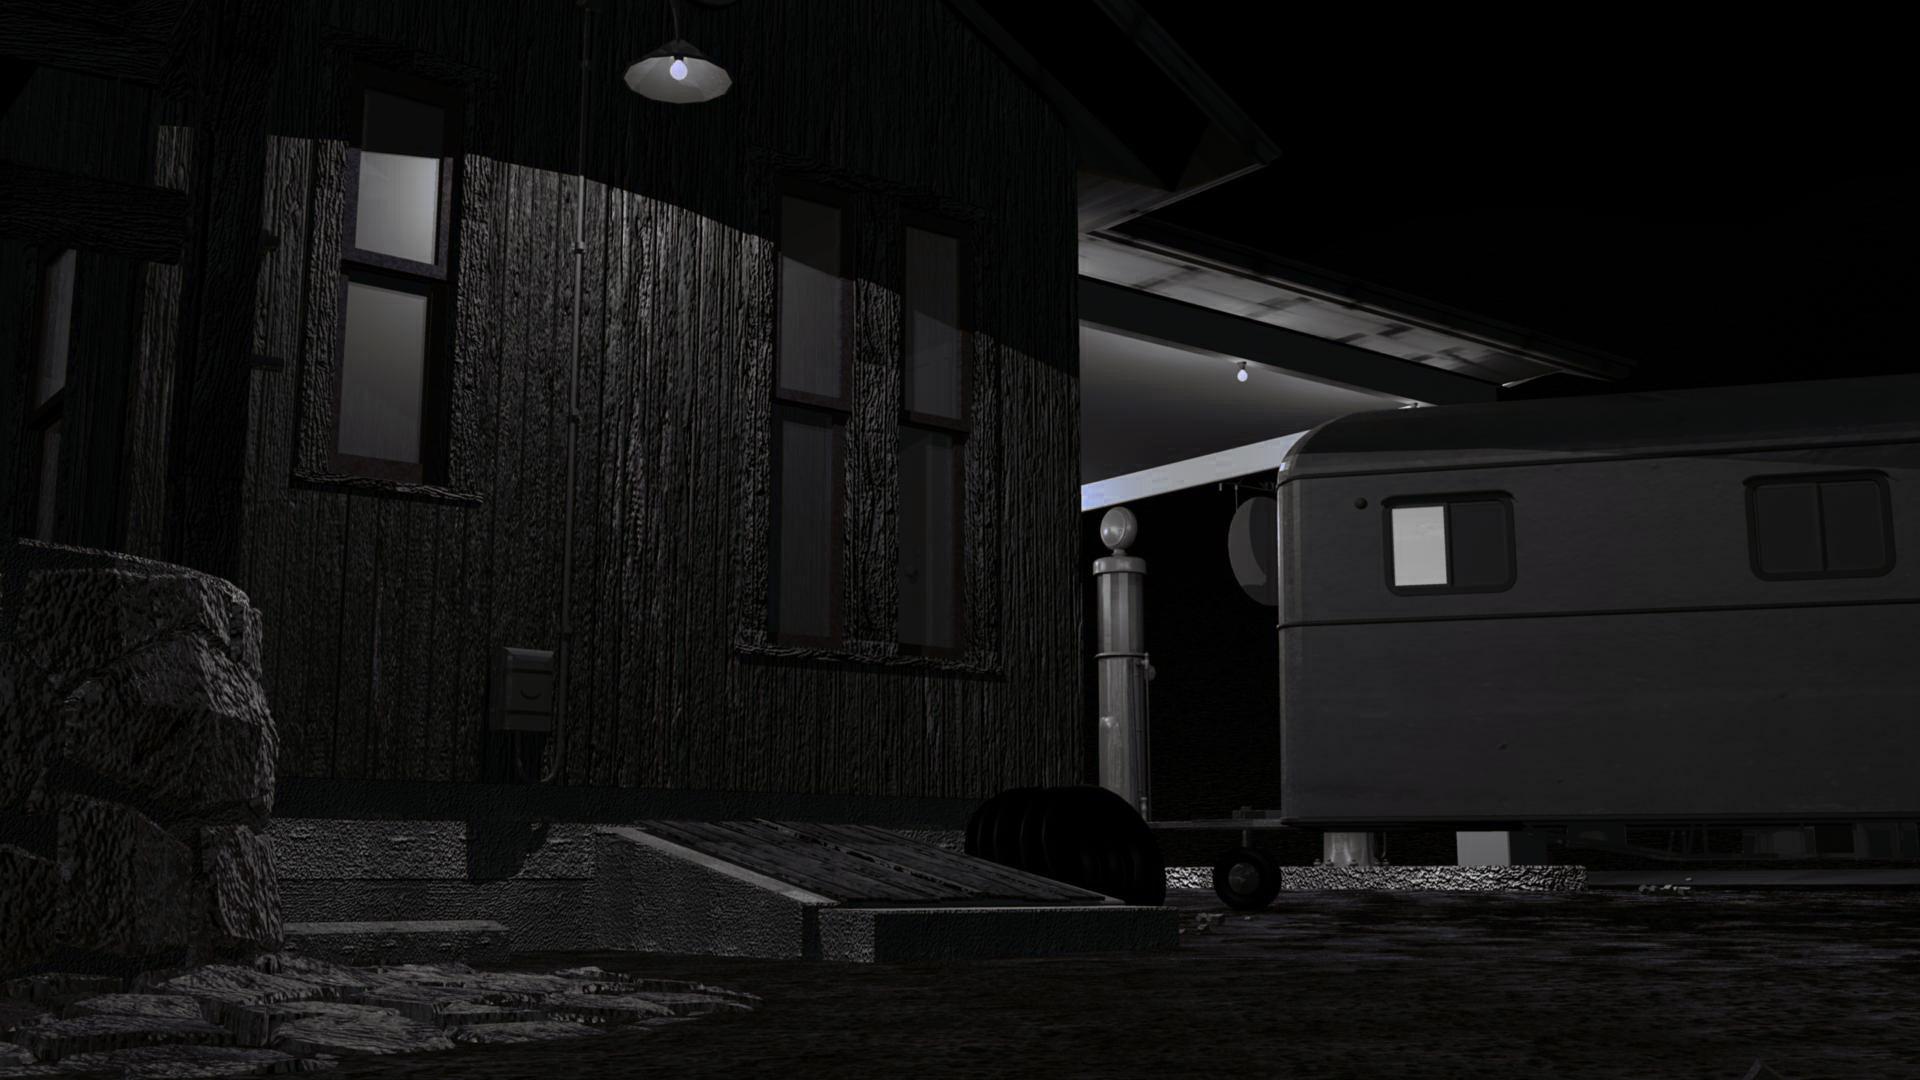 Film Noir Wallpaper Film noir 1920x1080